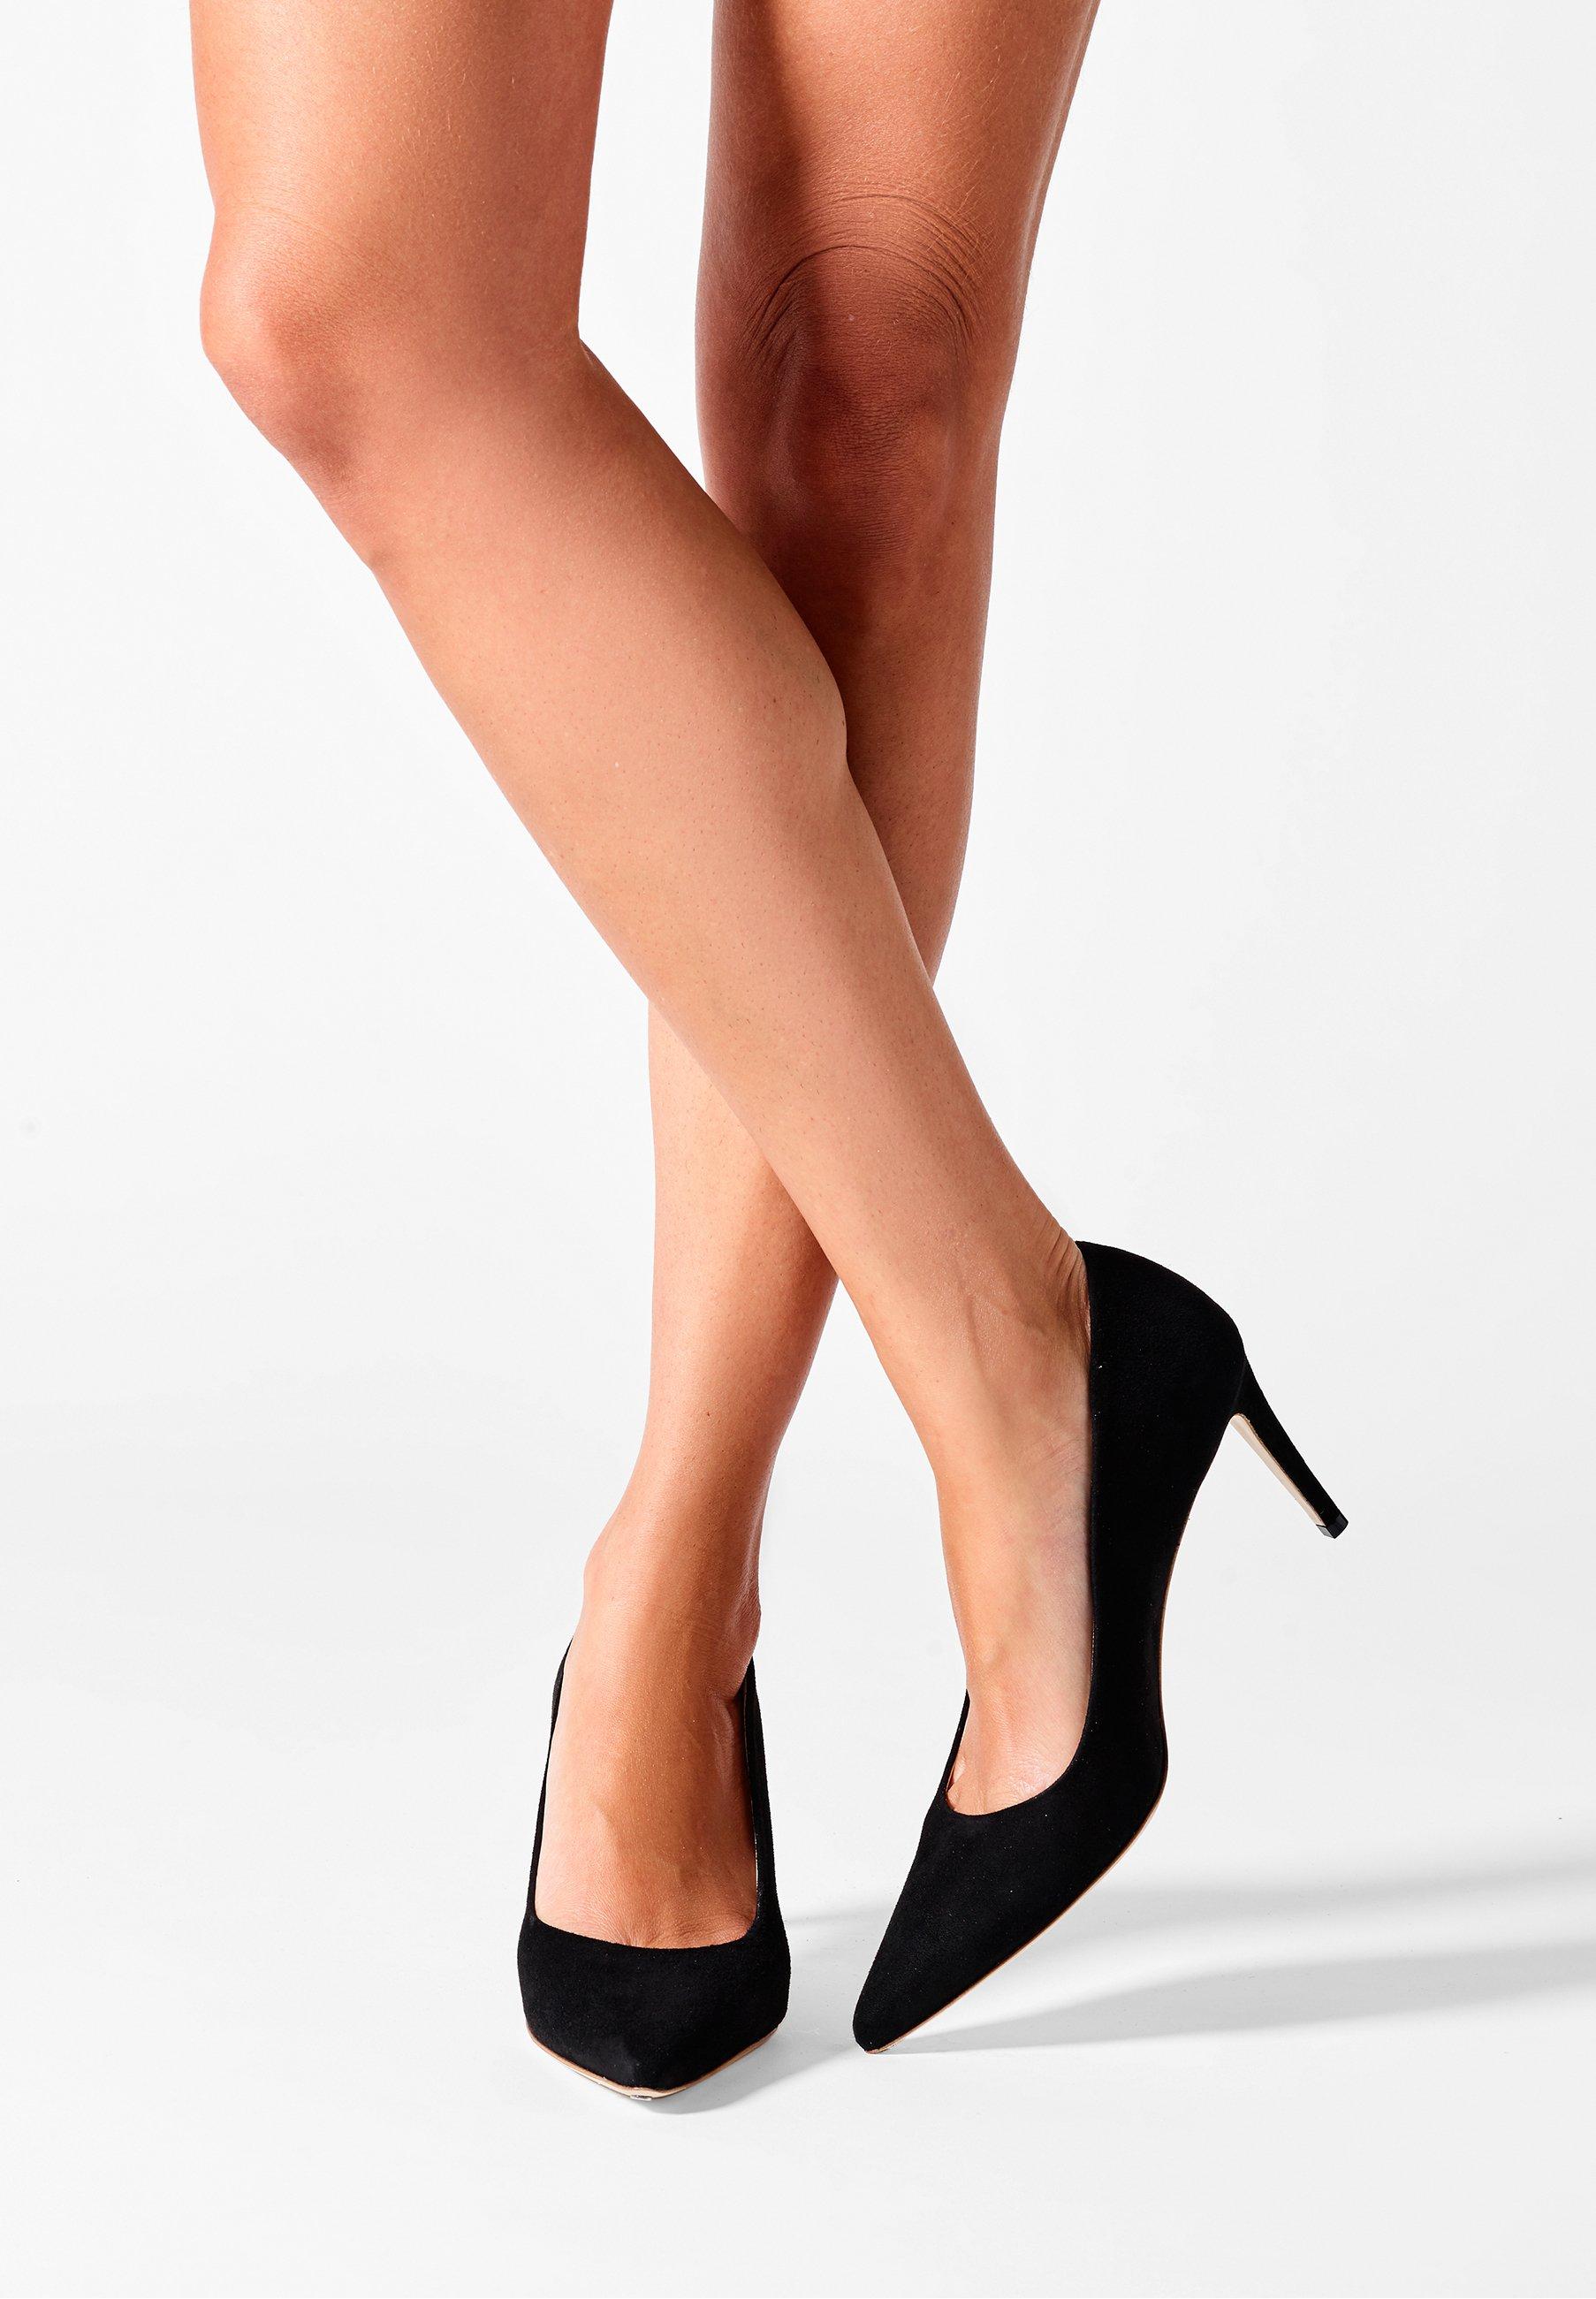 Femme DEEP BLACK - Escarpins